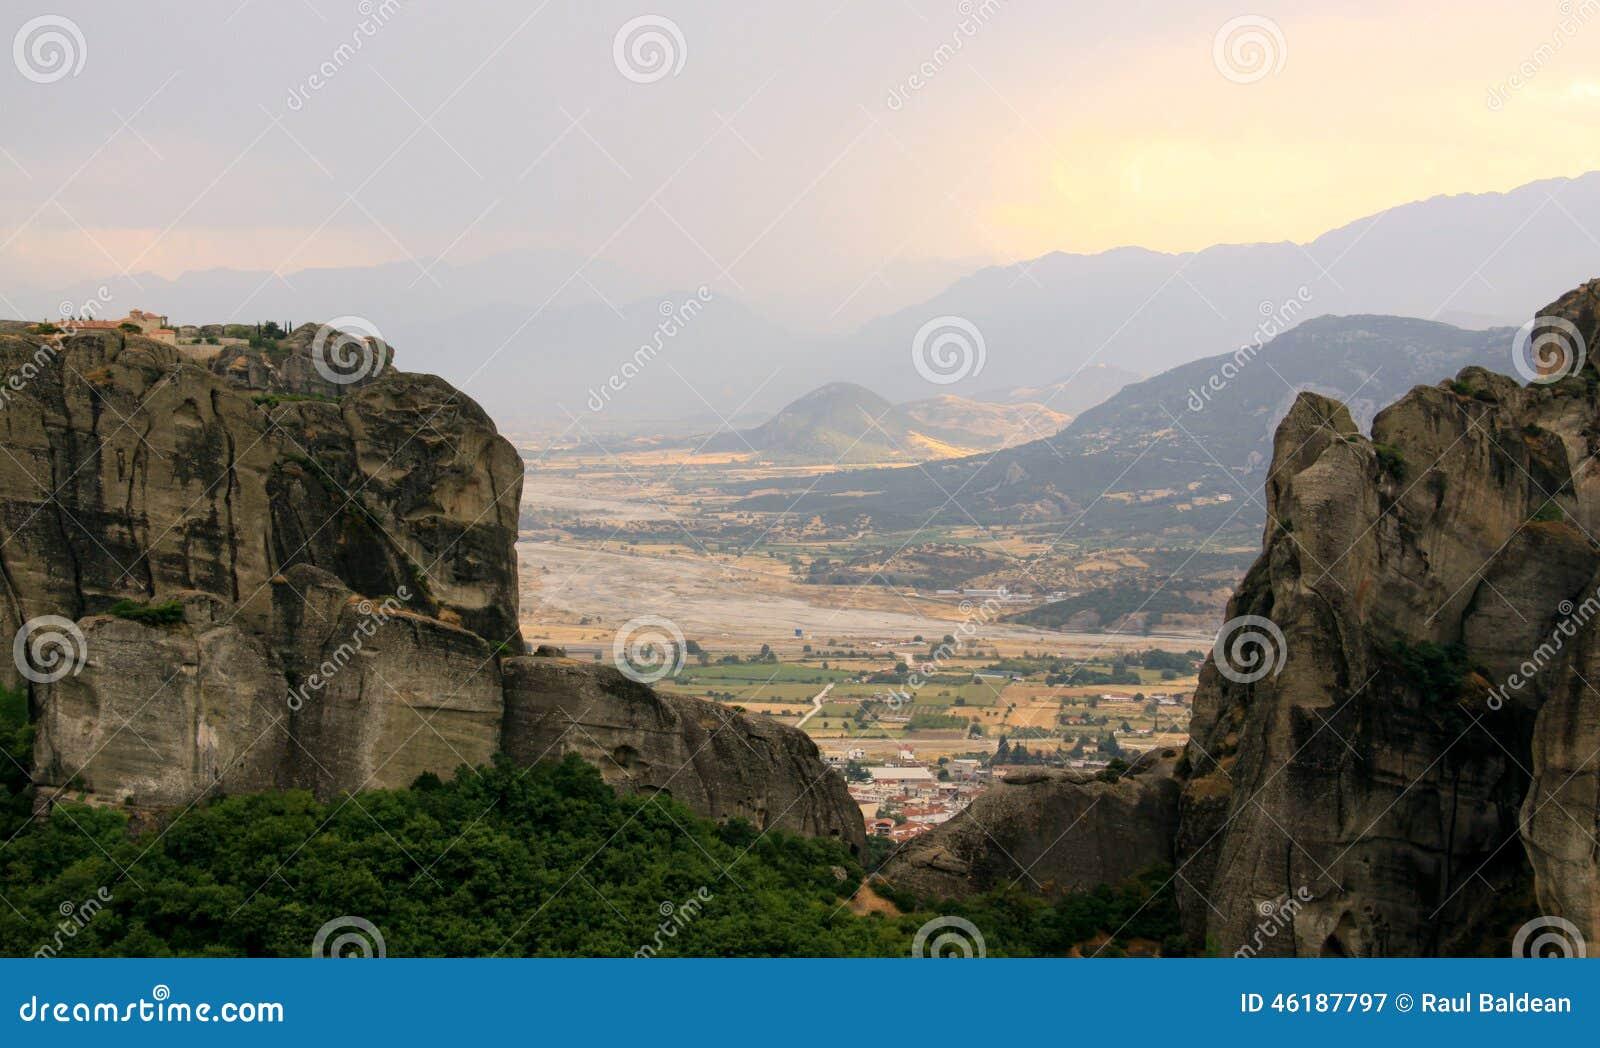 Monasteries at sunset, Meteora